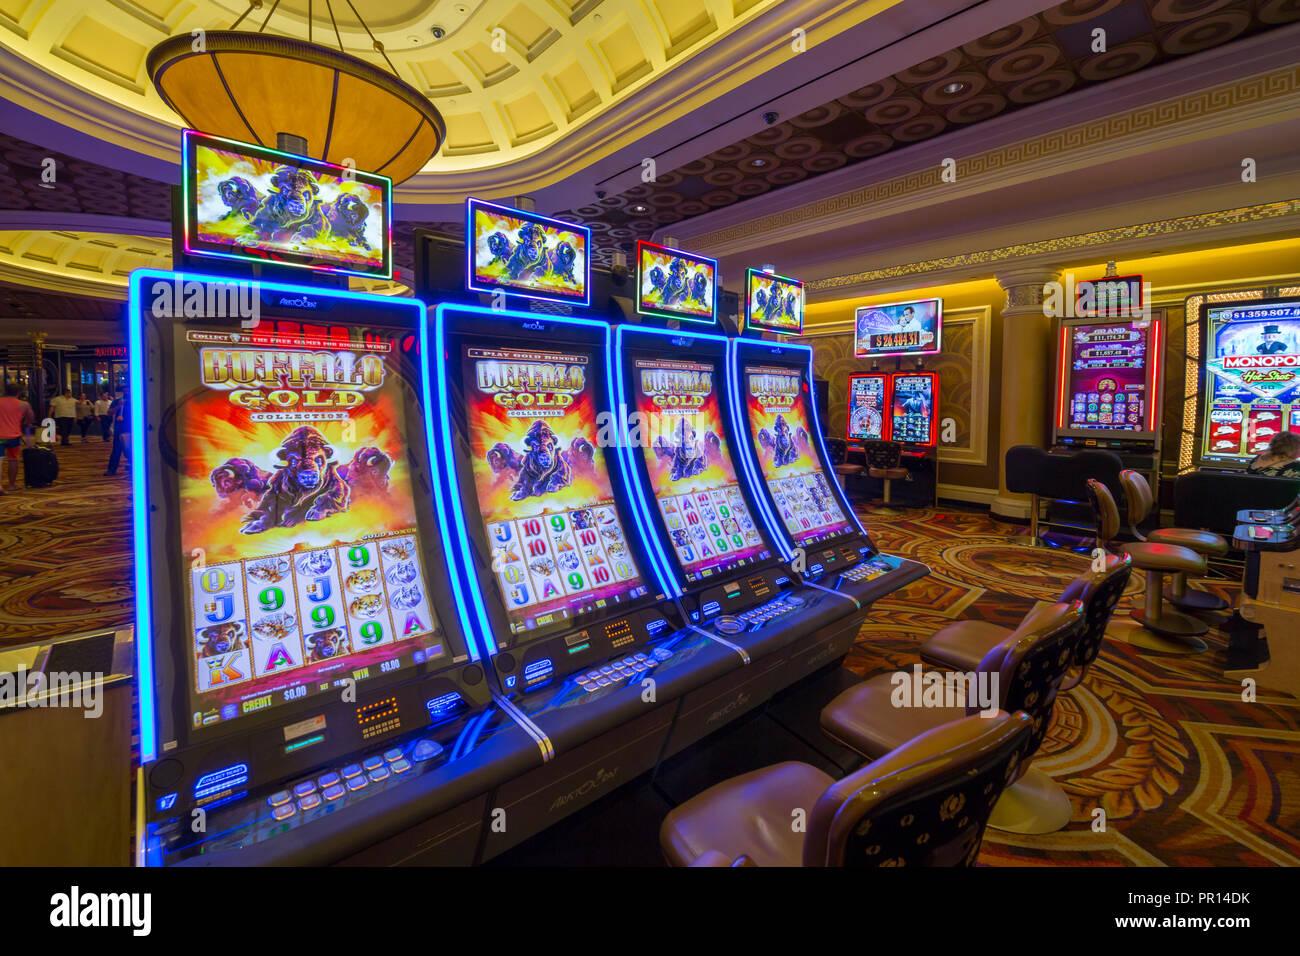 Gambling machines in Caesars Palace Hotel and Casino, Las Vegas, Nevada, United States of America, North America - Stock Image